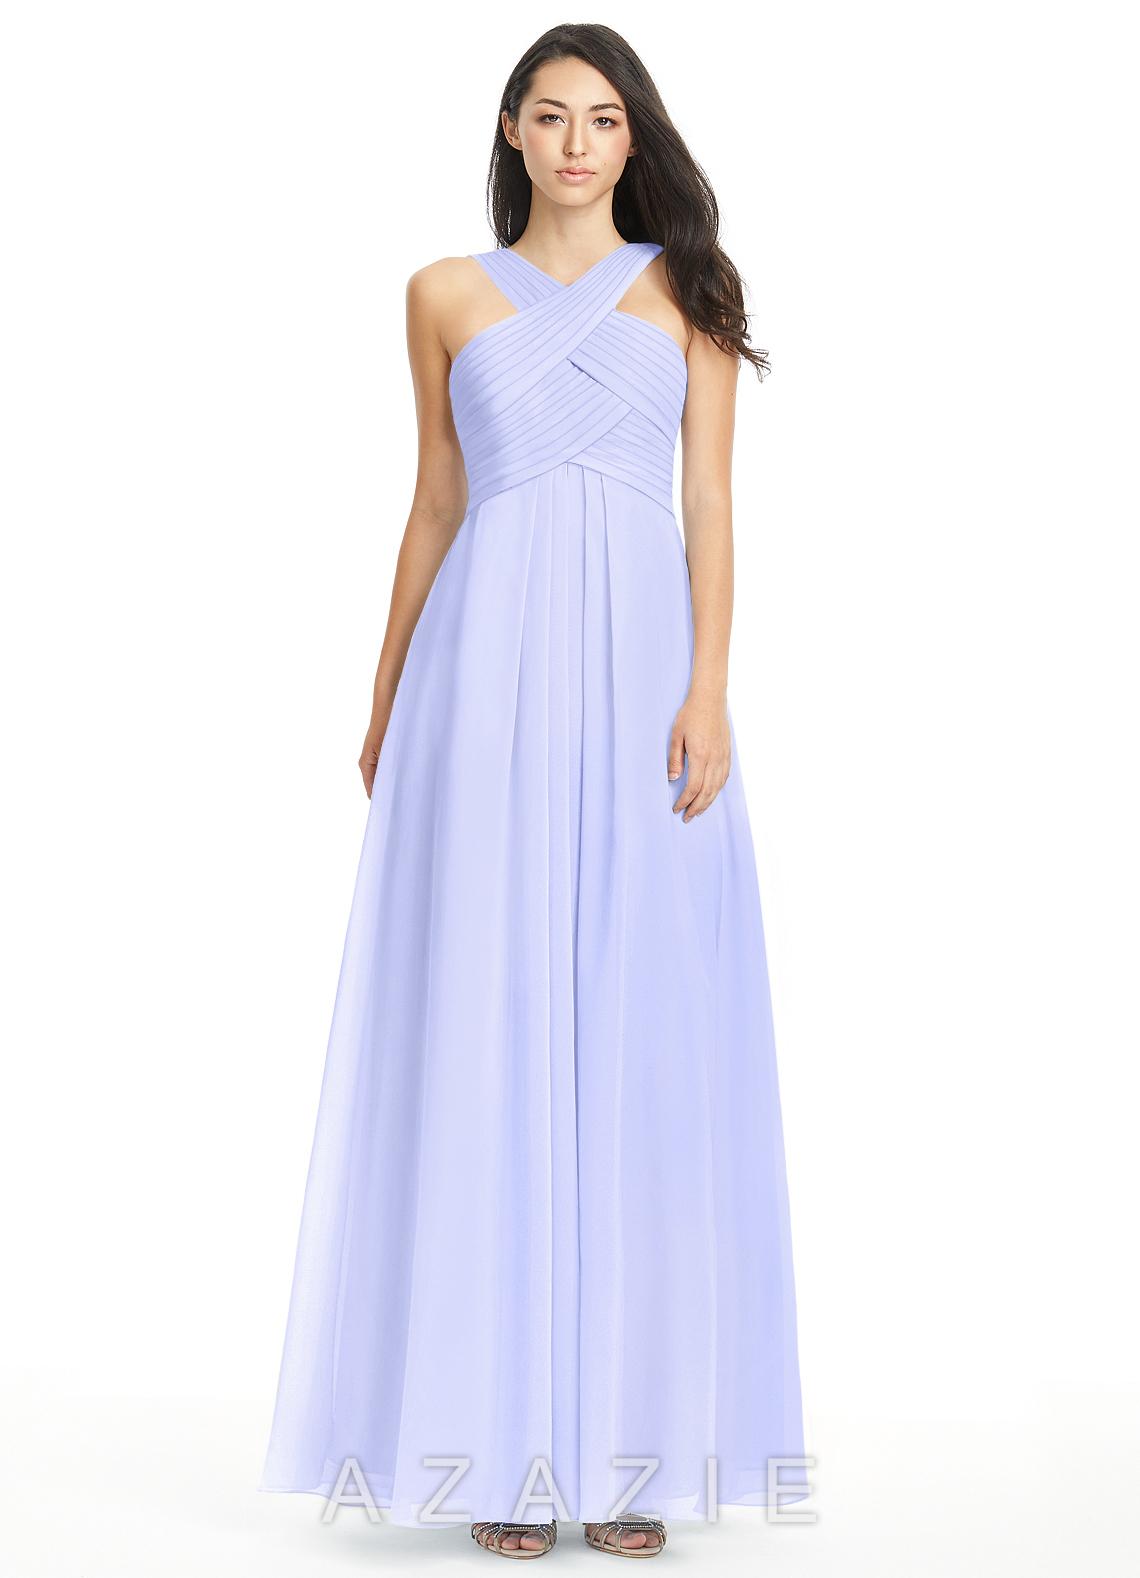 Lavender bridesmaid dresses lavender gowns azazie azazie kaleigh azazie kaleigh ombrellifo Image collections